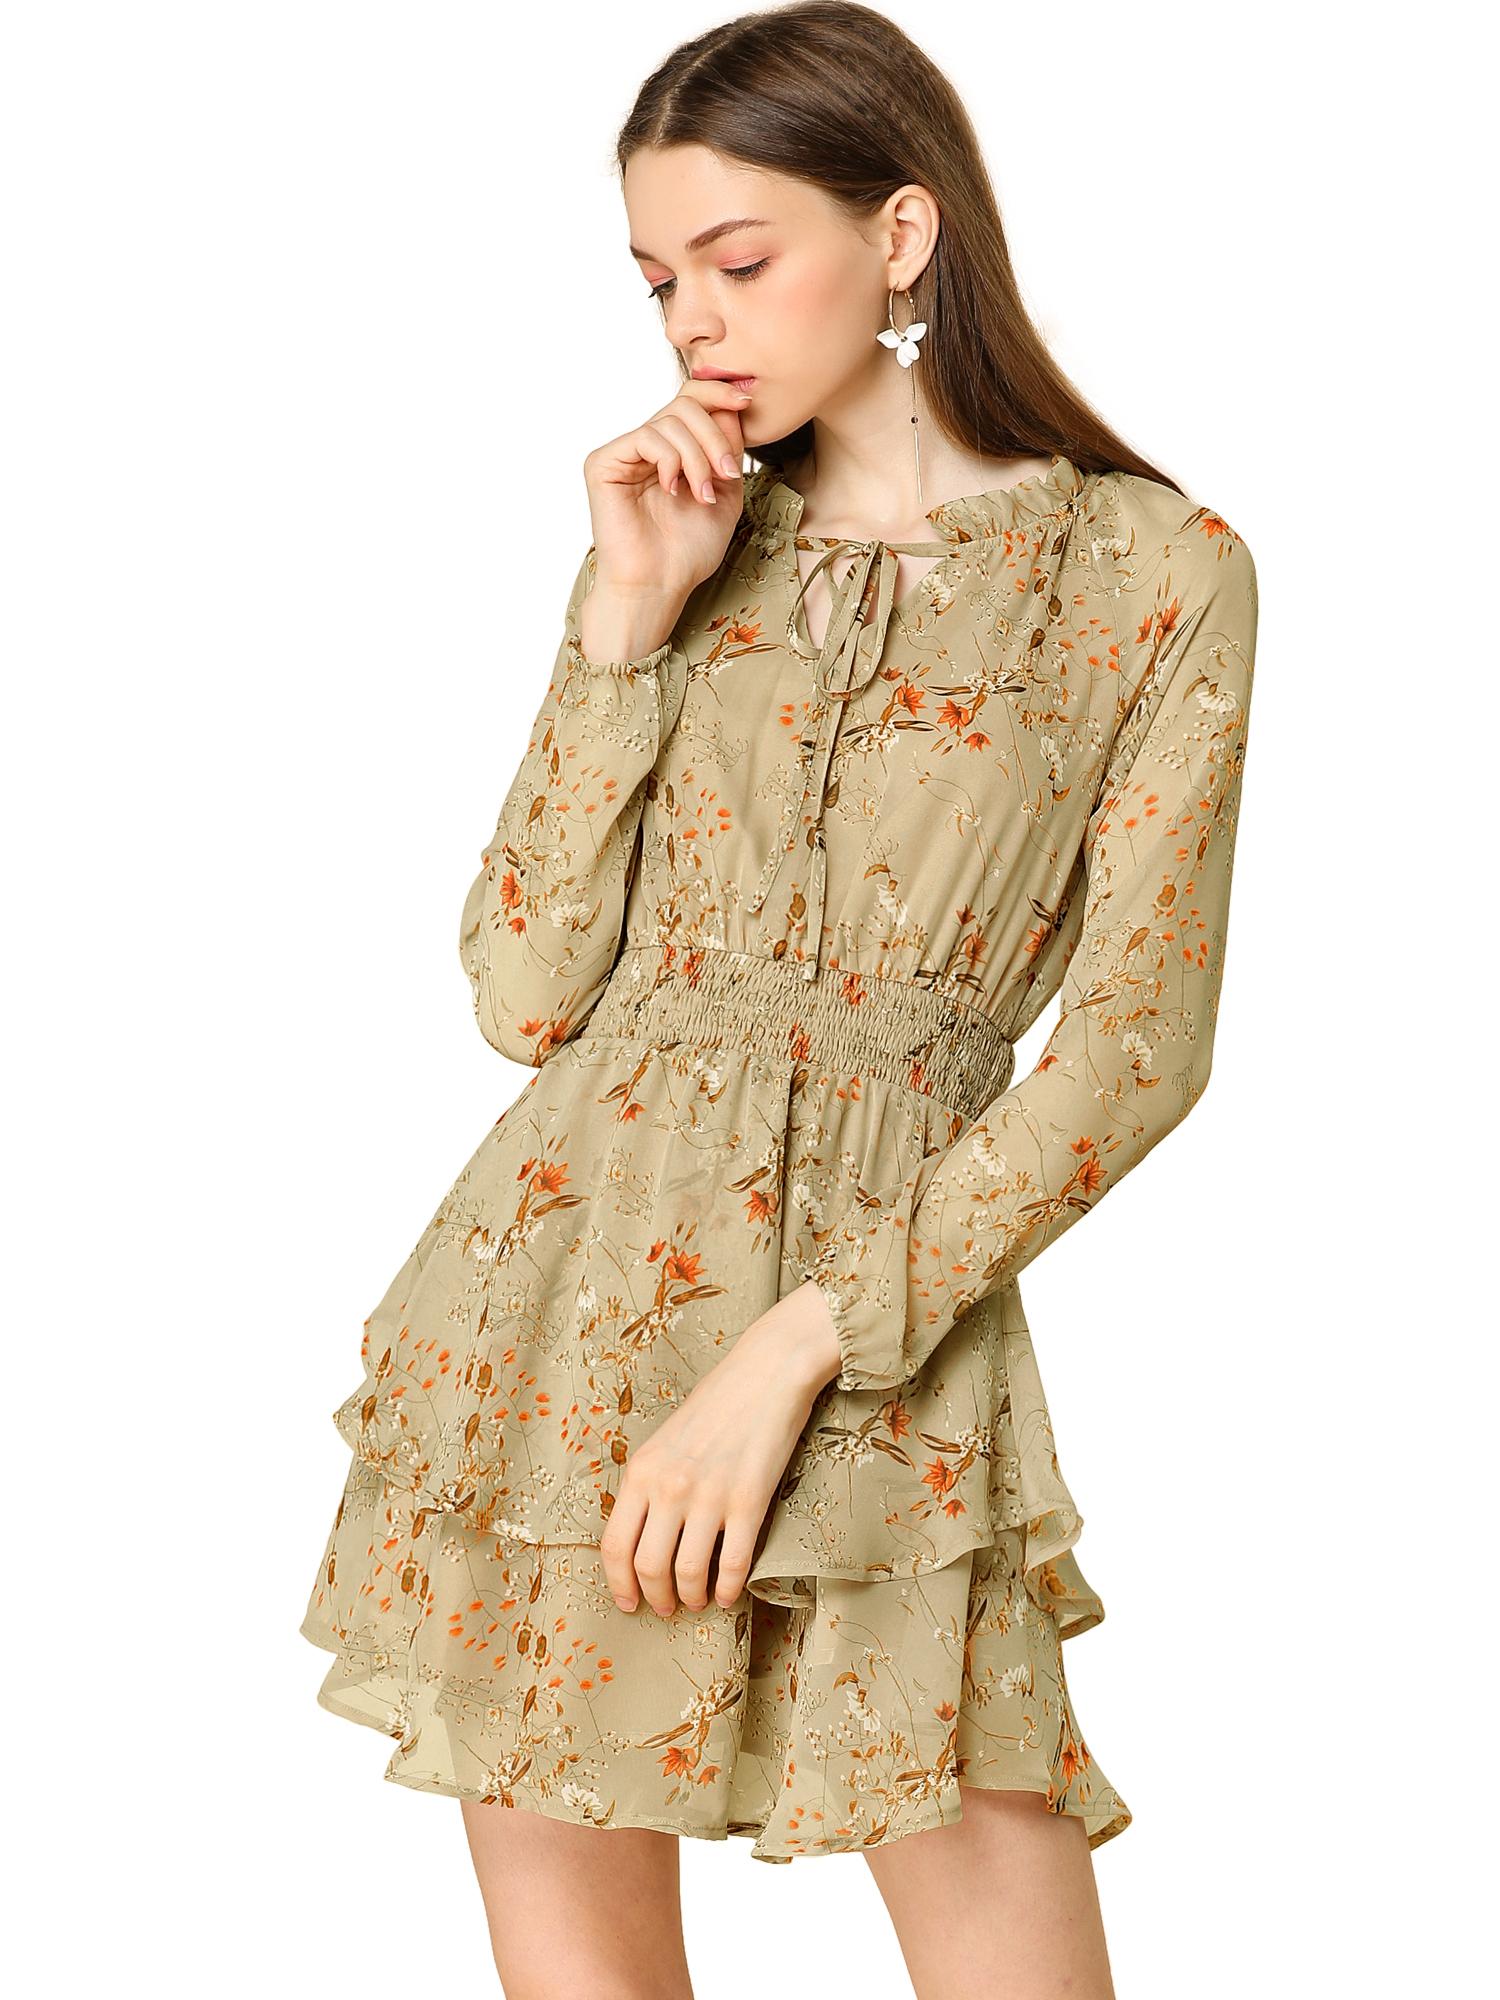 Allegra K Women's Floral Smocked Waist Chiffon Dress Khaki M